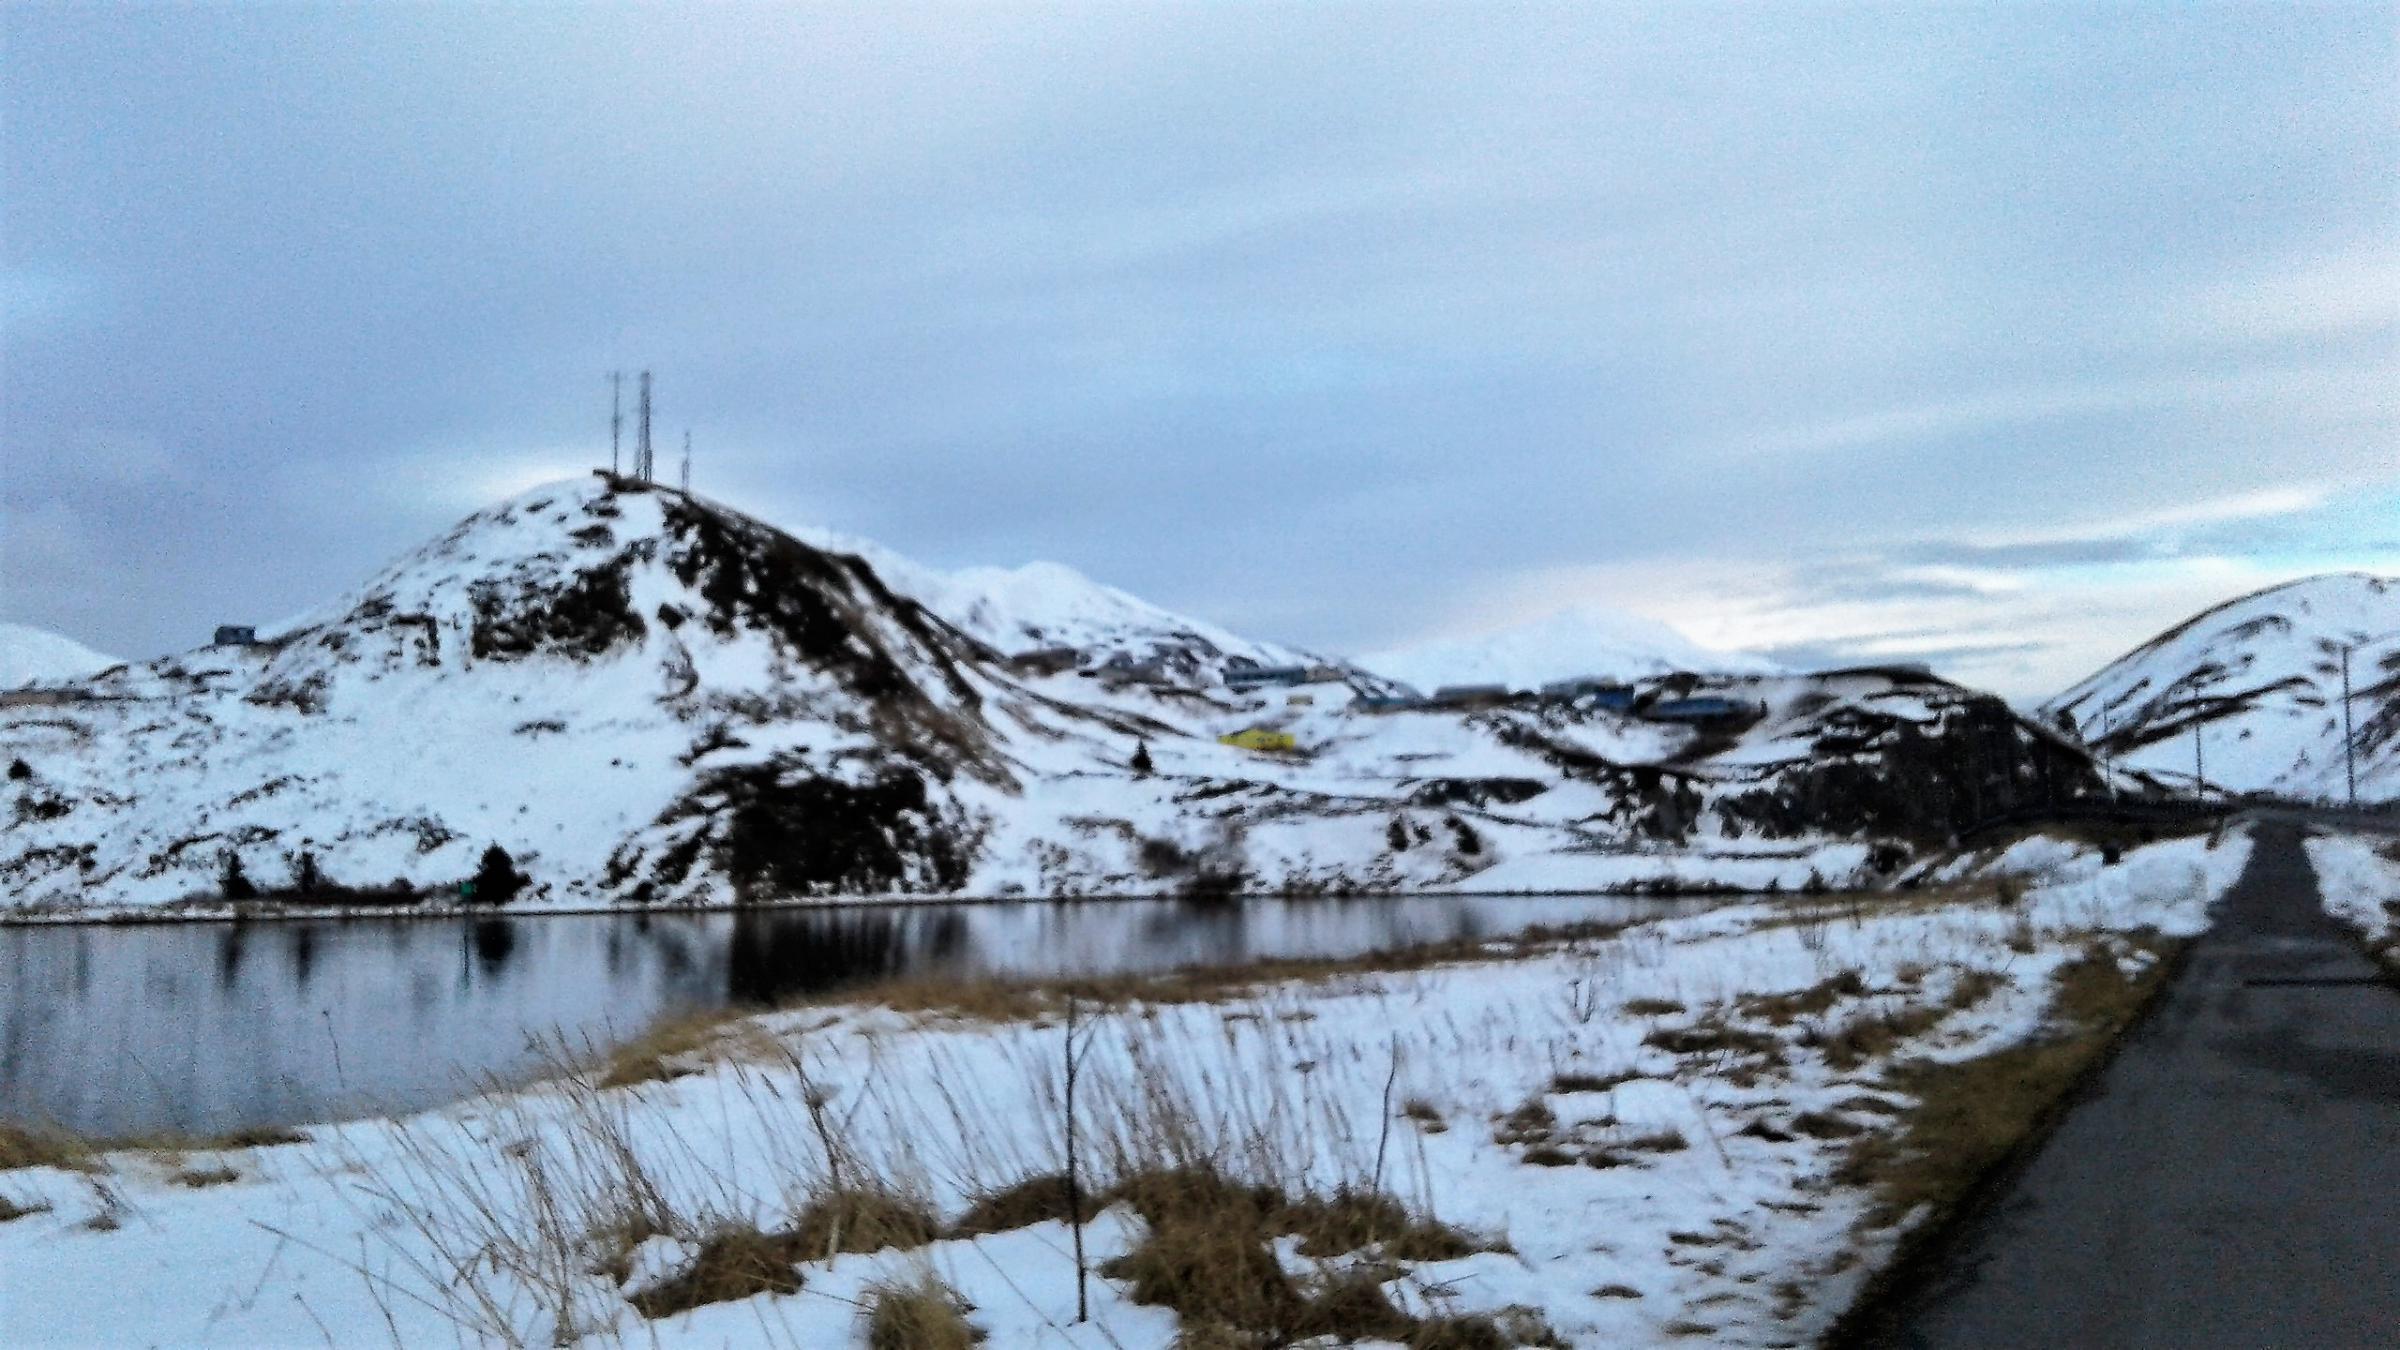 Missing Another Deadline, GCI Delays Launch Of Unalaska's 4G